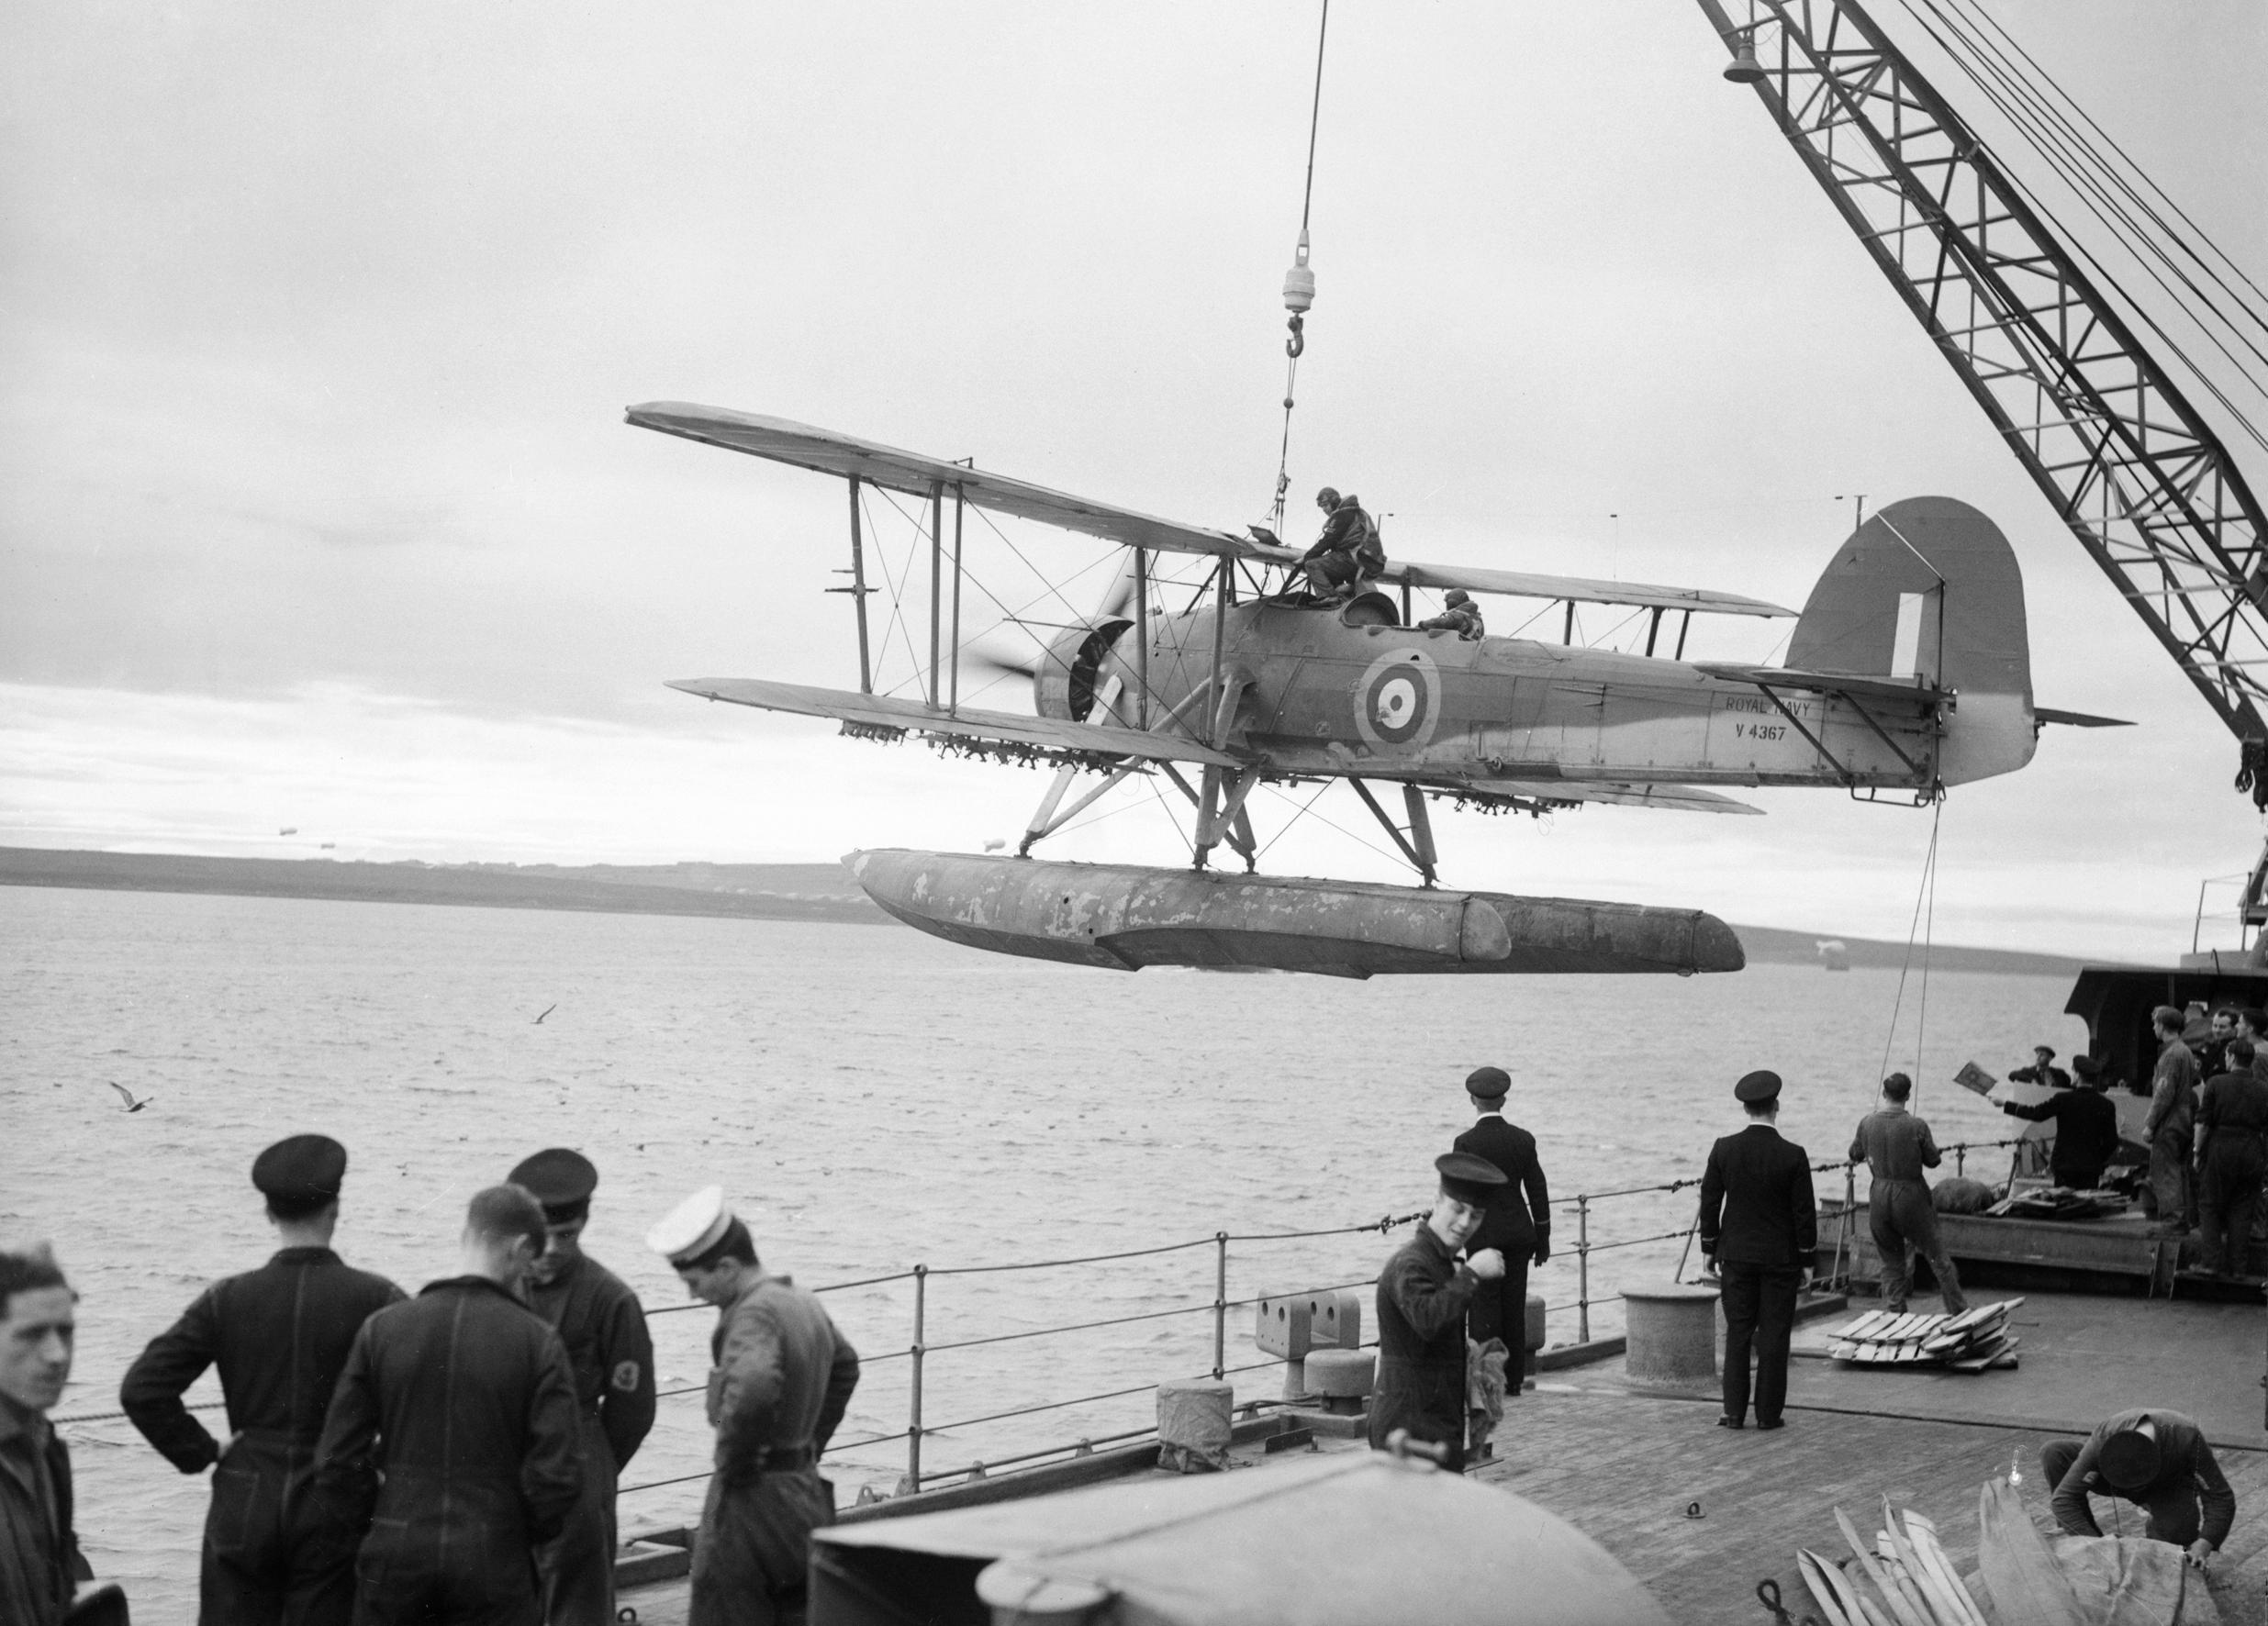 Swordfish Mk.I - 701 Sqn FAA, HMS Malaya, 1/50 SMER A_Fairey_Swordfish_being_hoisted_aboard_HMS_MALAYA,_October_1941._A5694